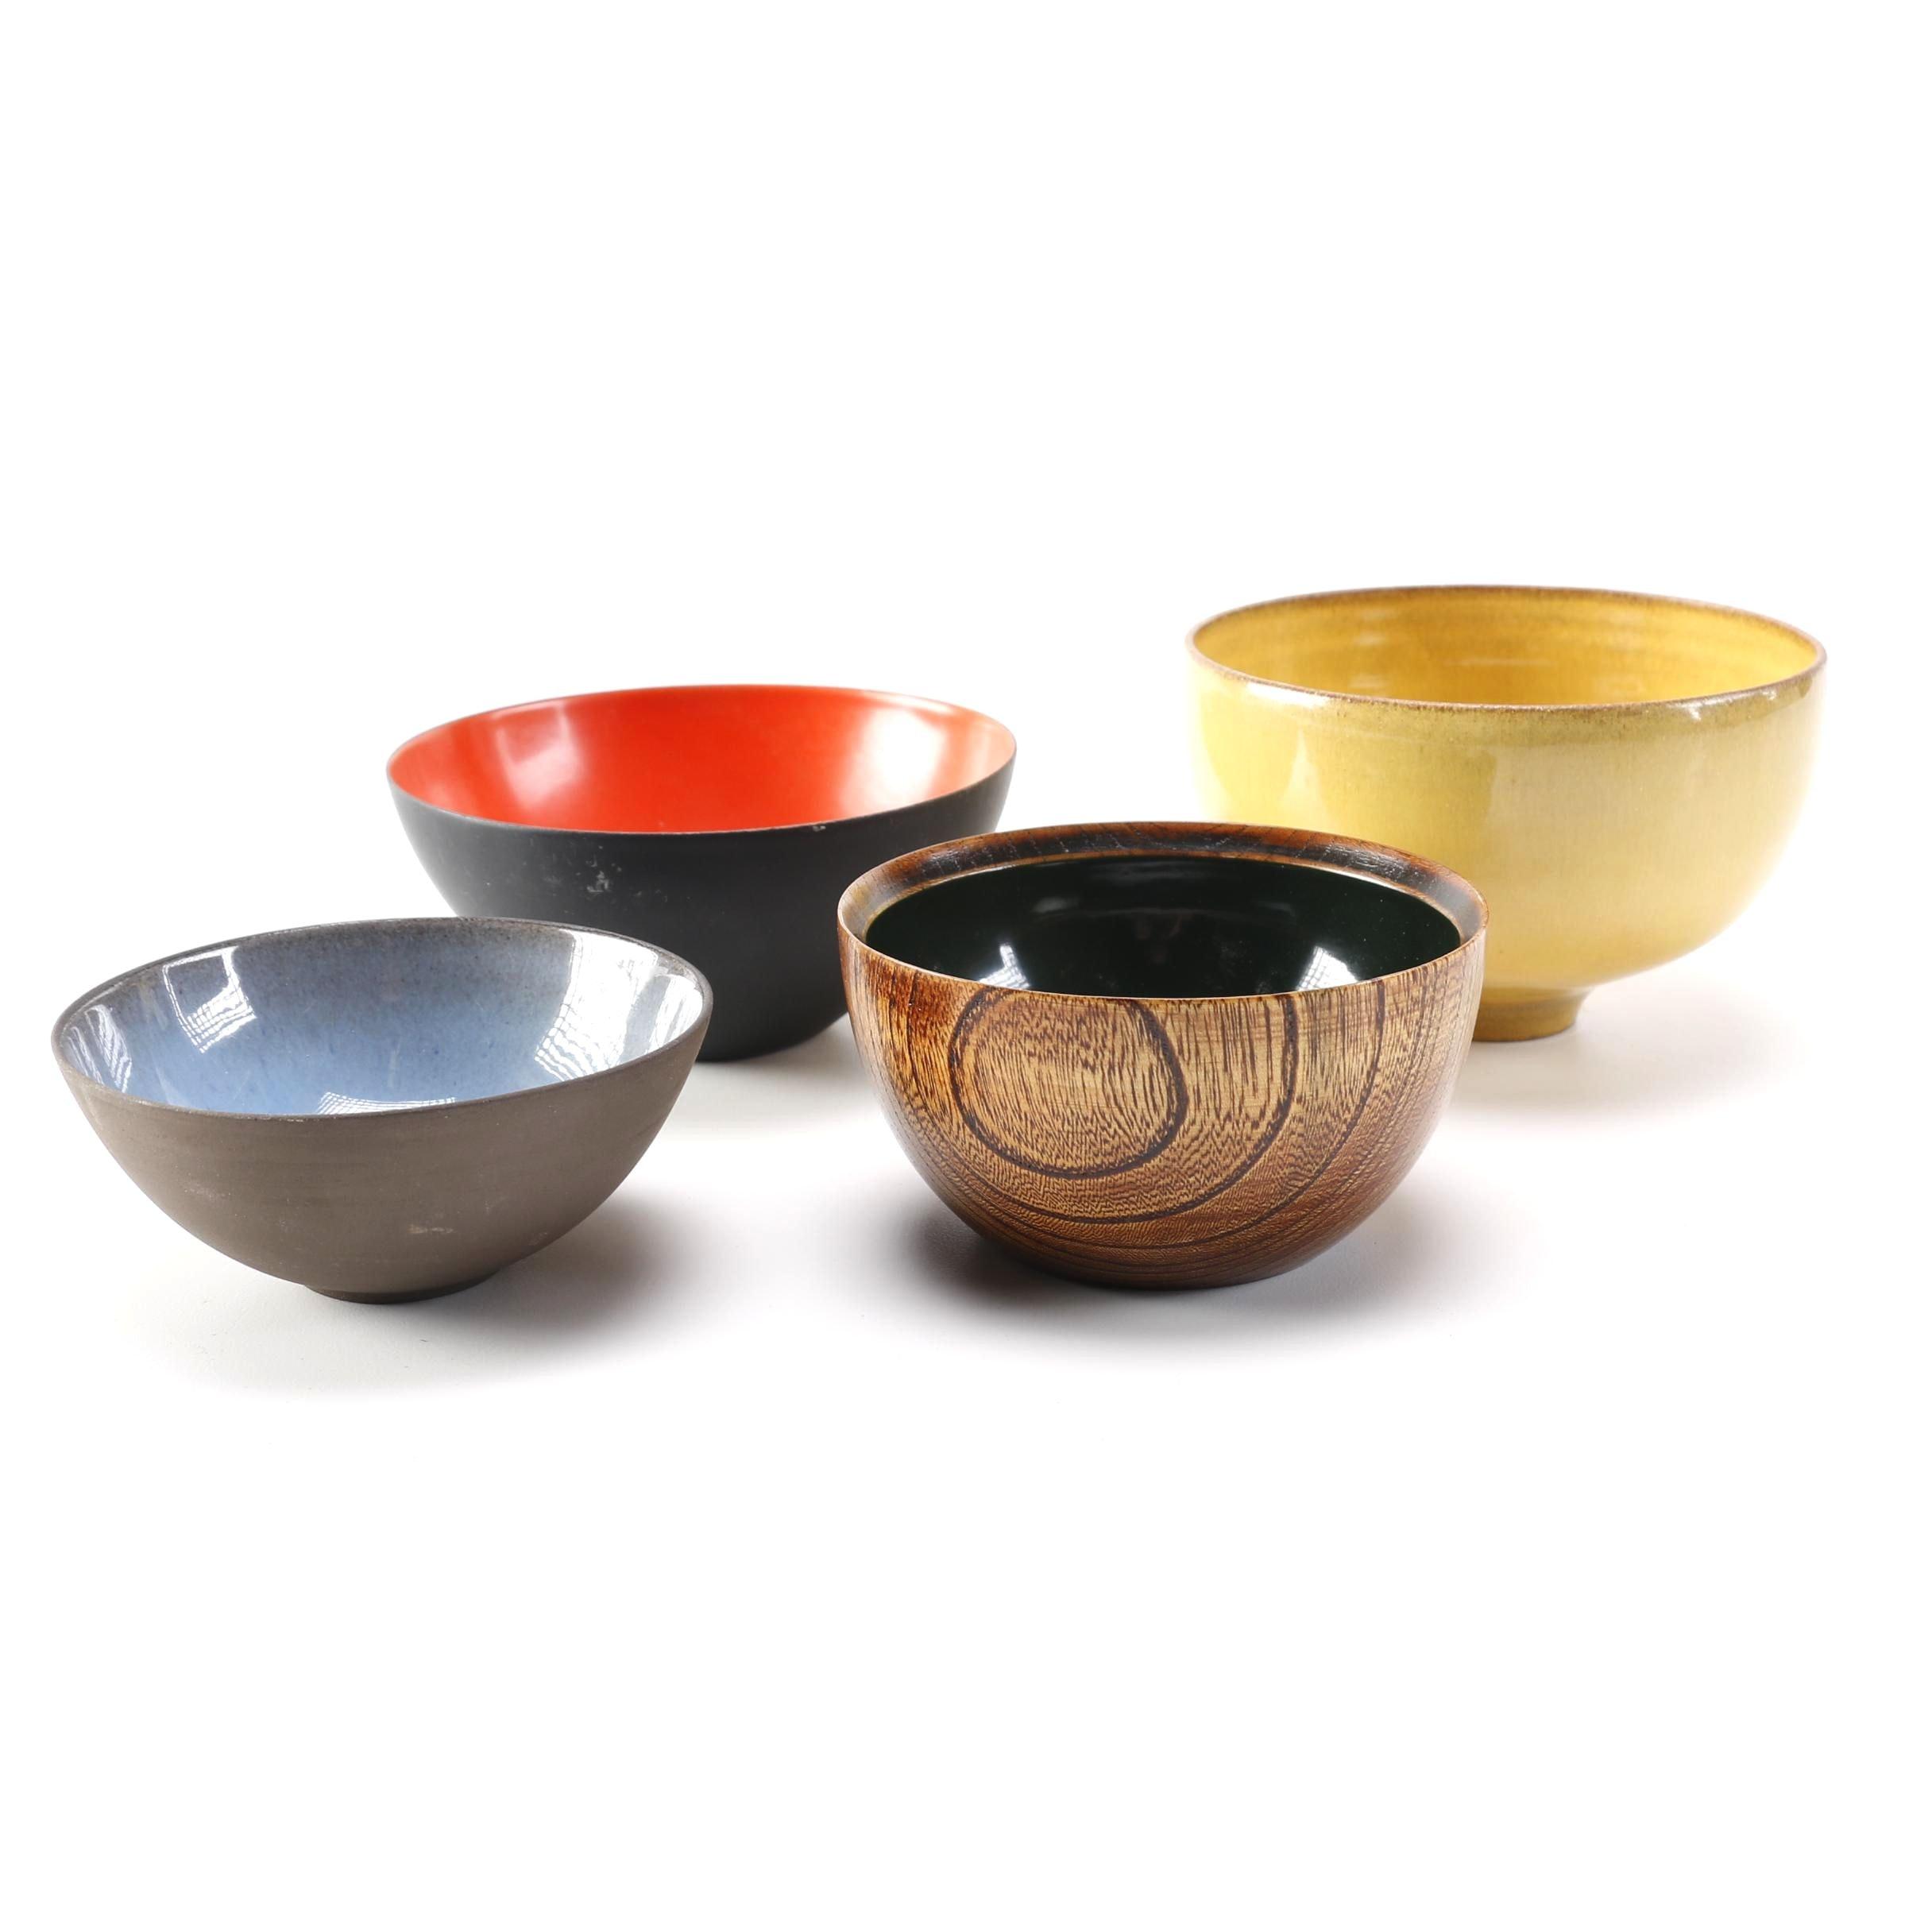 Modern Objet d'Art Bowls Including Gertrud and Otto Natzler